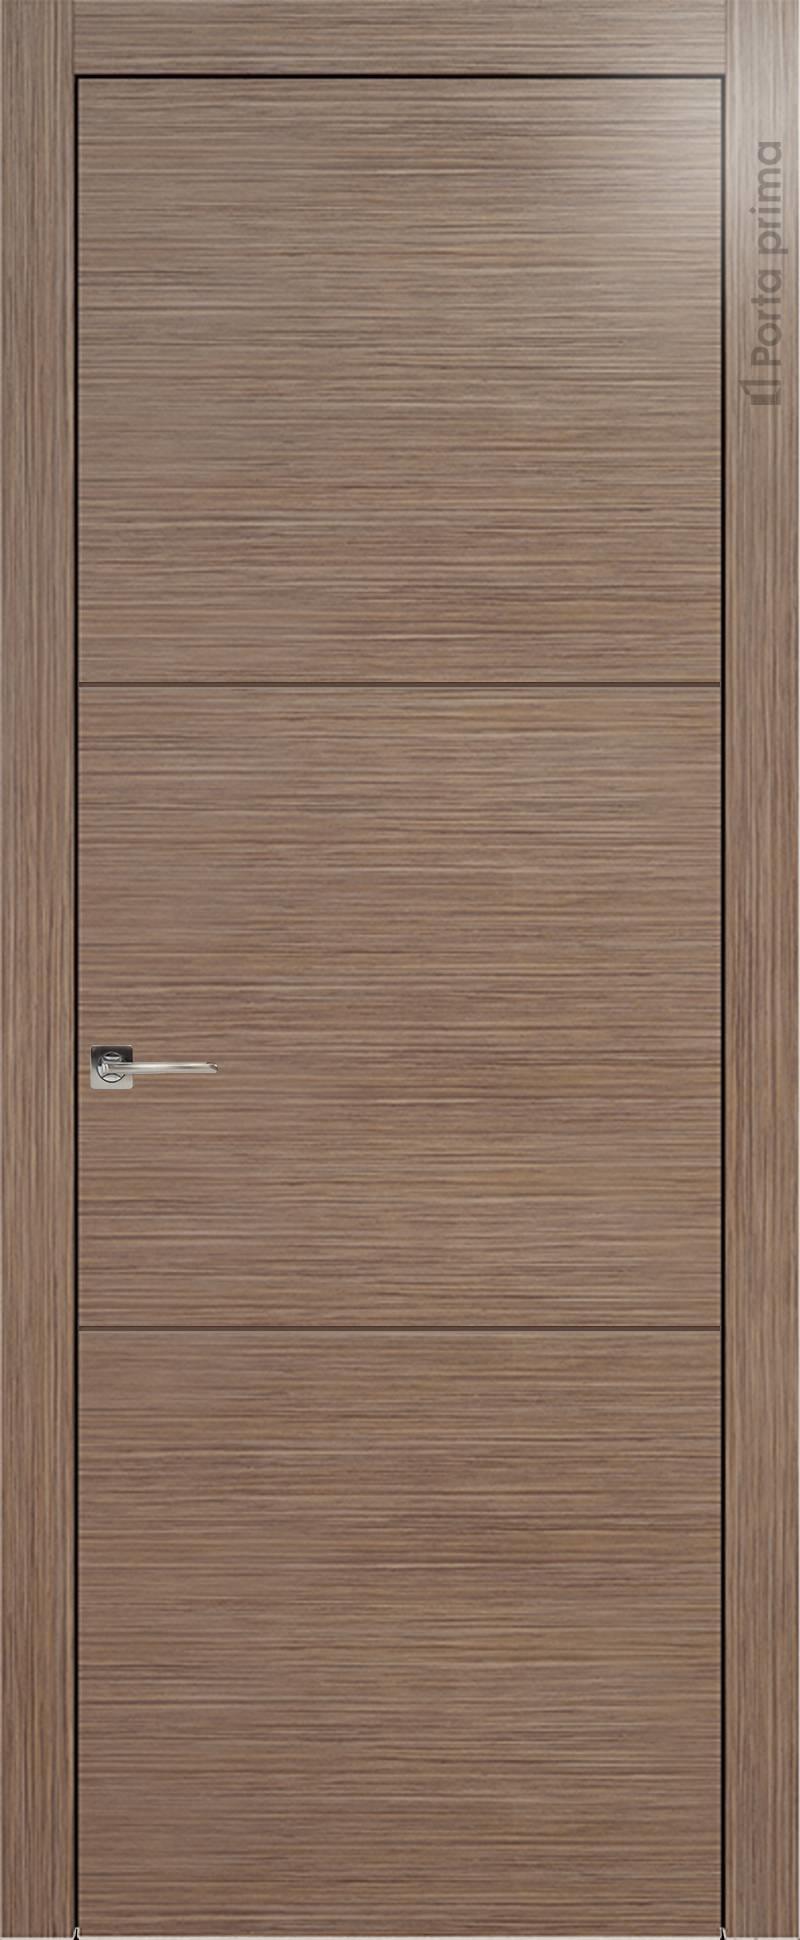 Tivoli В-2 цвет - Орех Без стекла (ДГ)